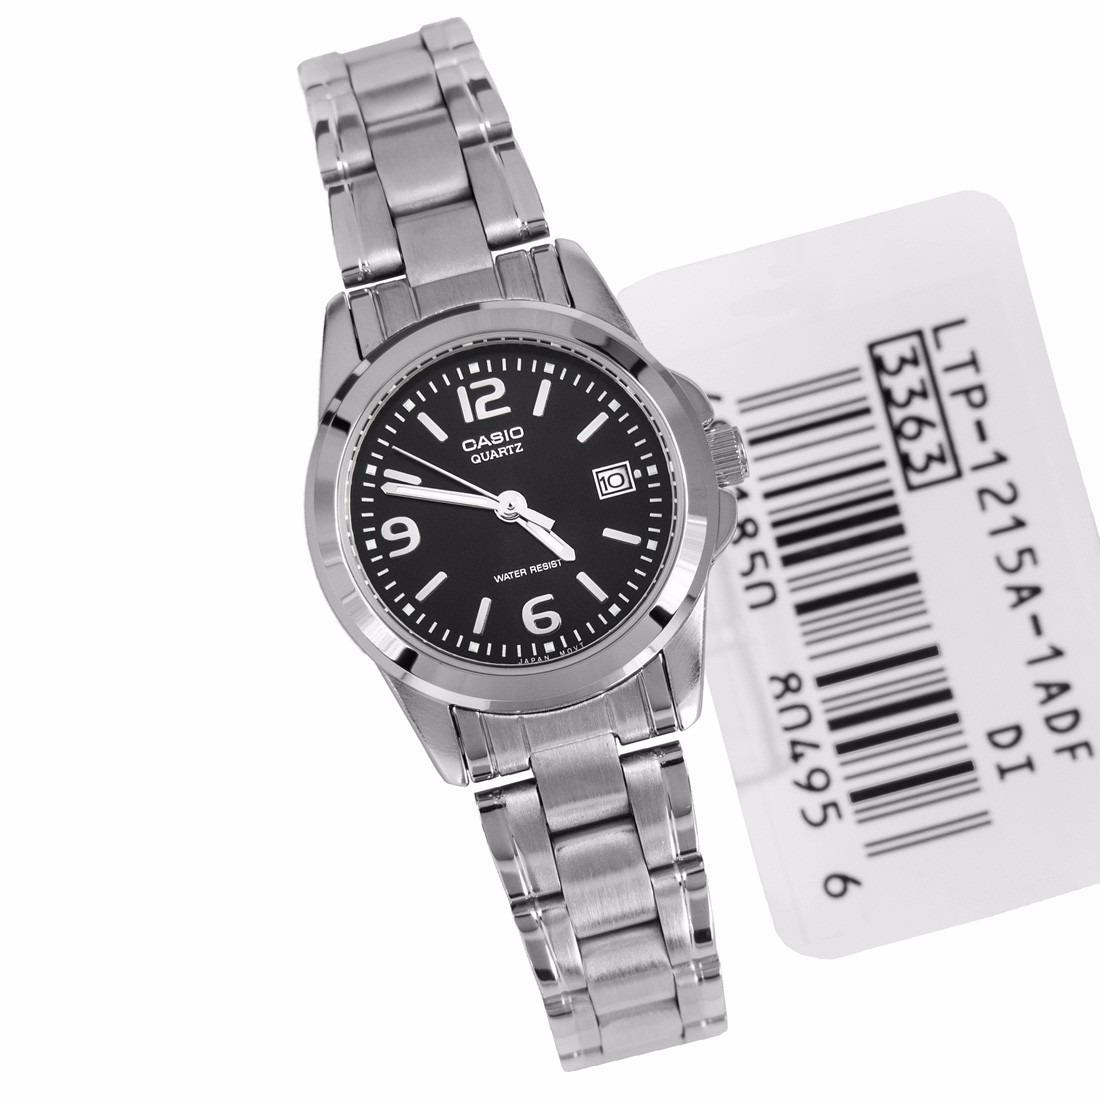 cd3277c59adc Reloj Casio Ltp-1215a-1 Mujer Acero W Resist Rosario -   2.473